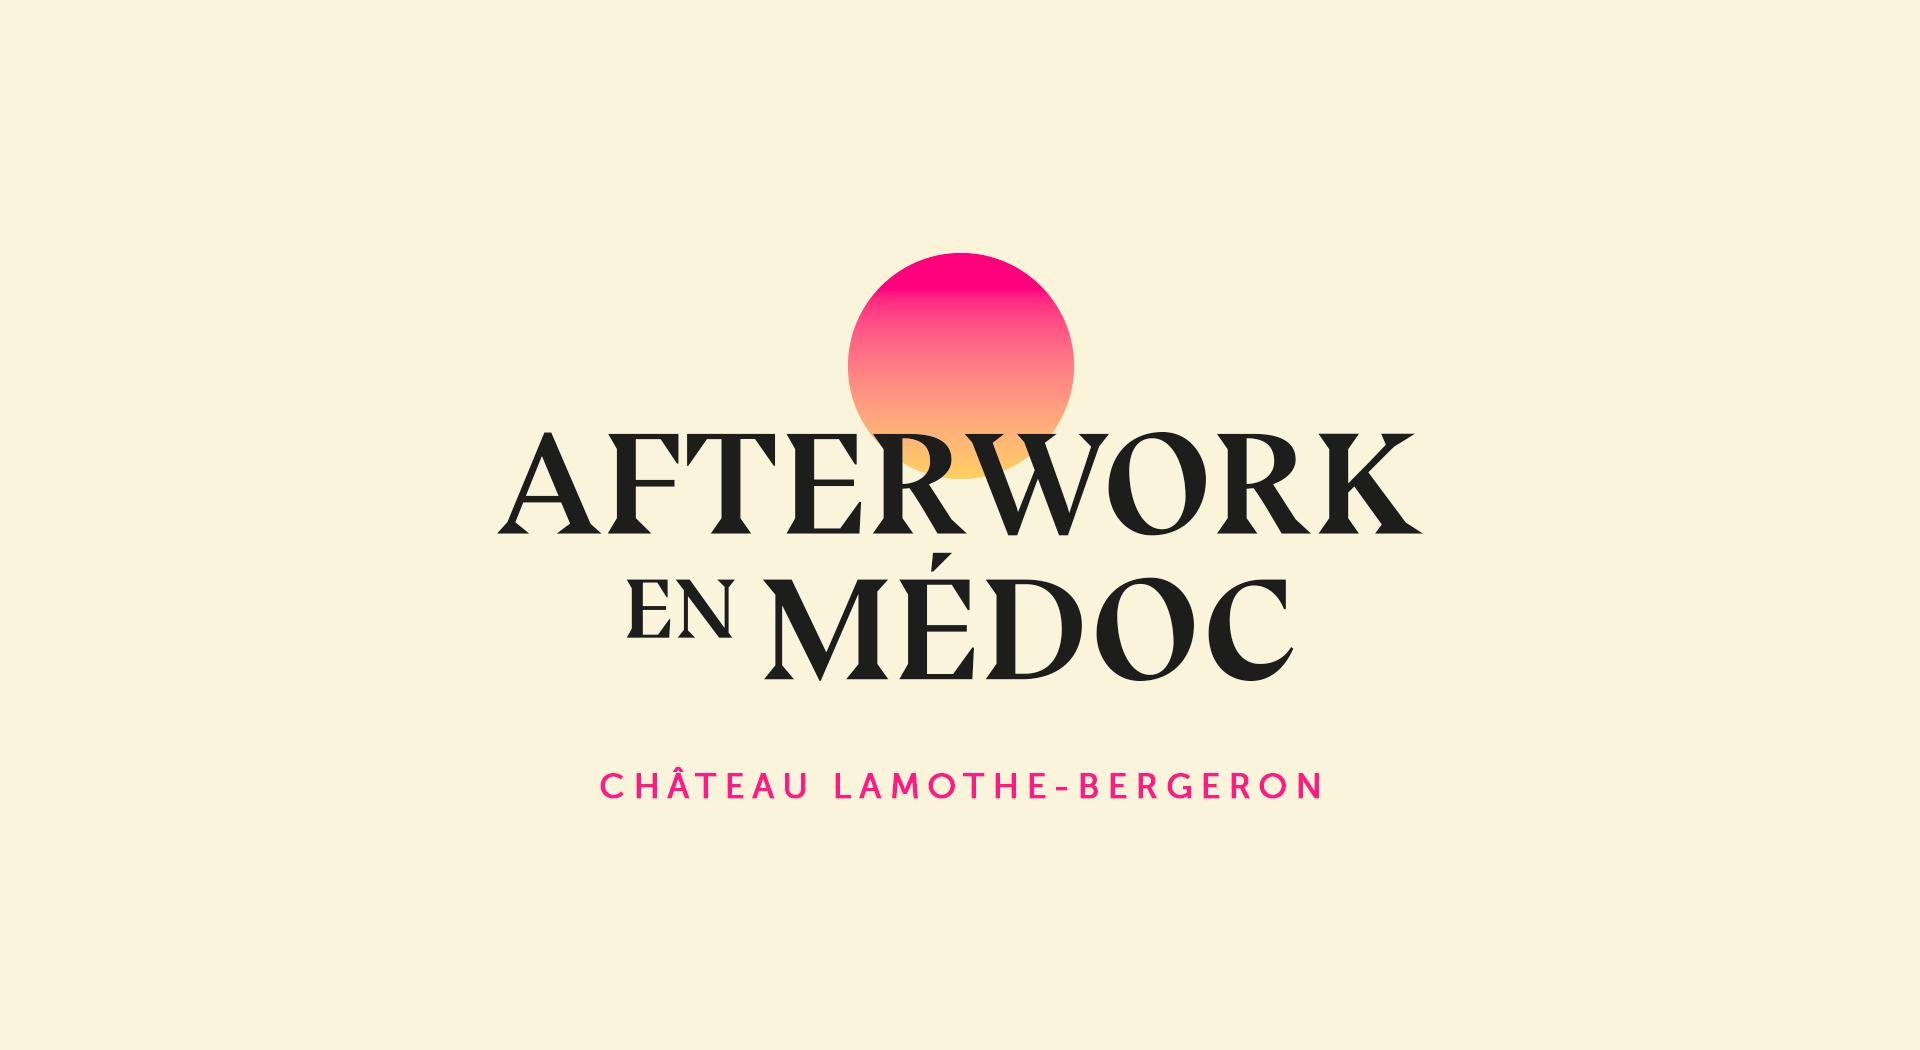 AWM_FB_LAMOTHE-BERGERON_EVENT COVER_1200x1005